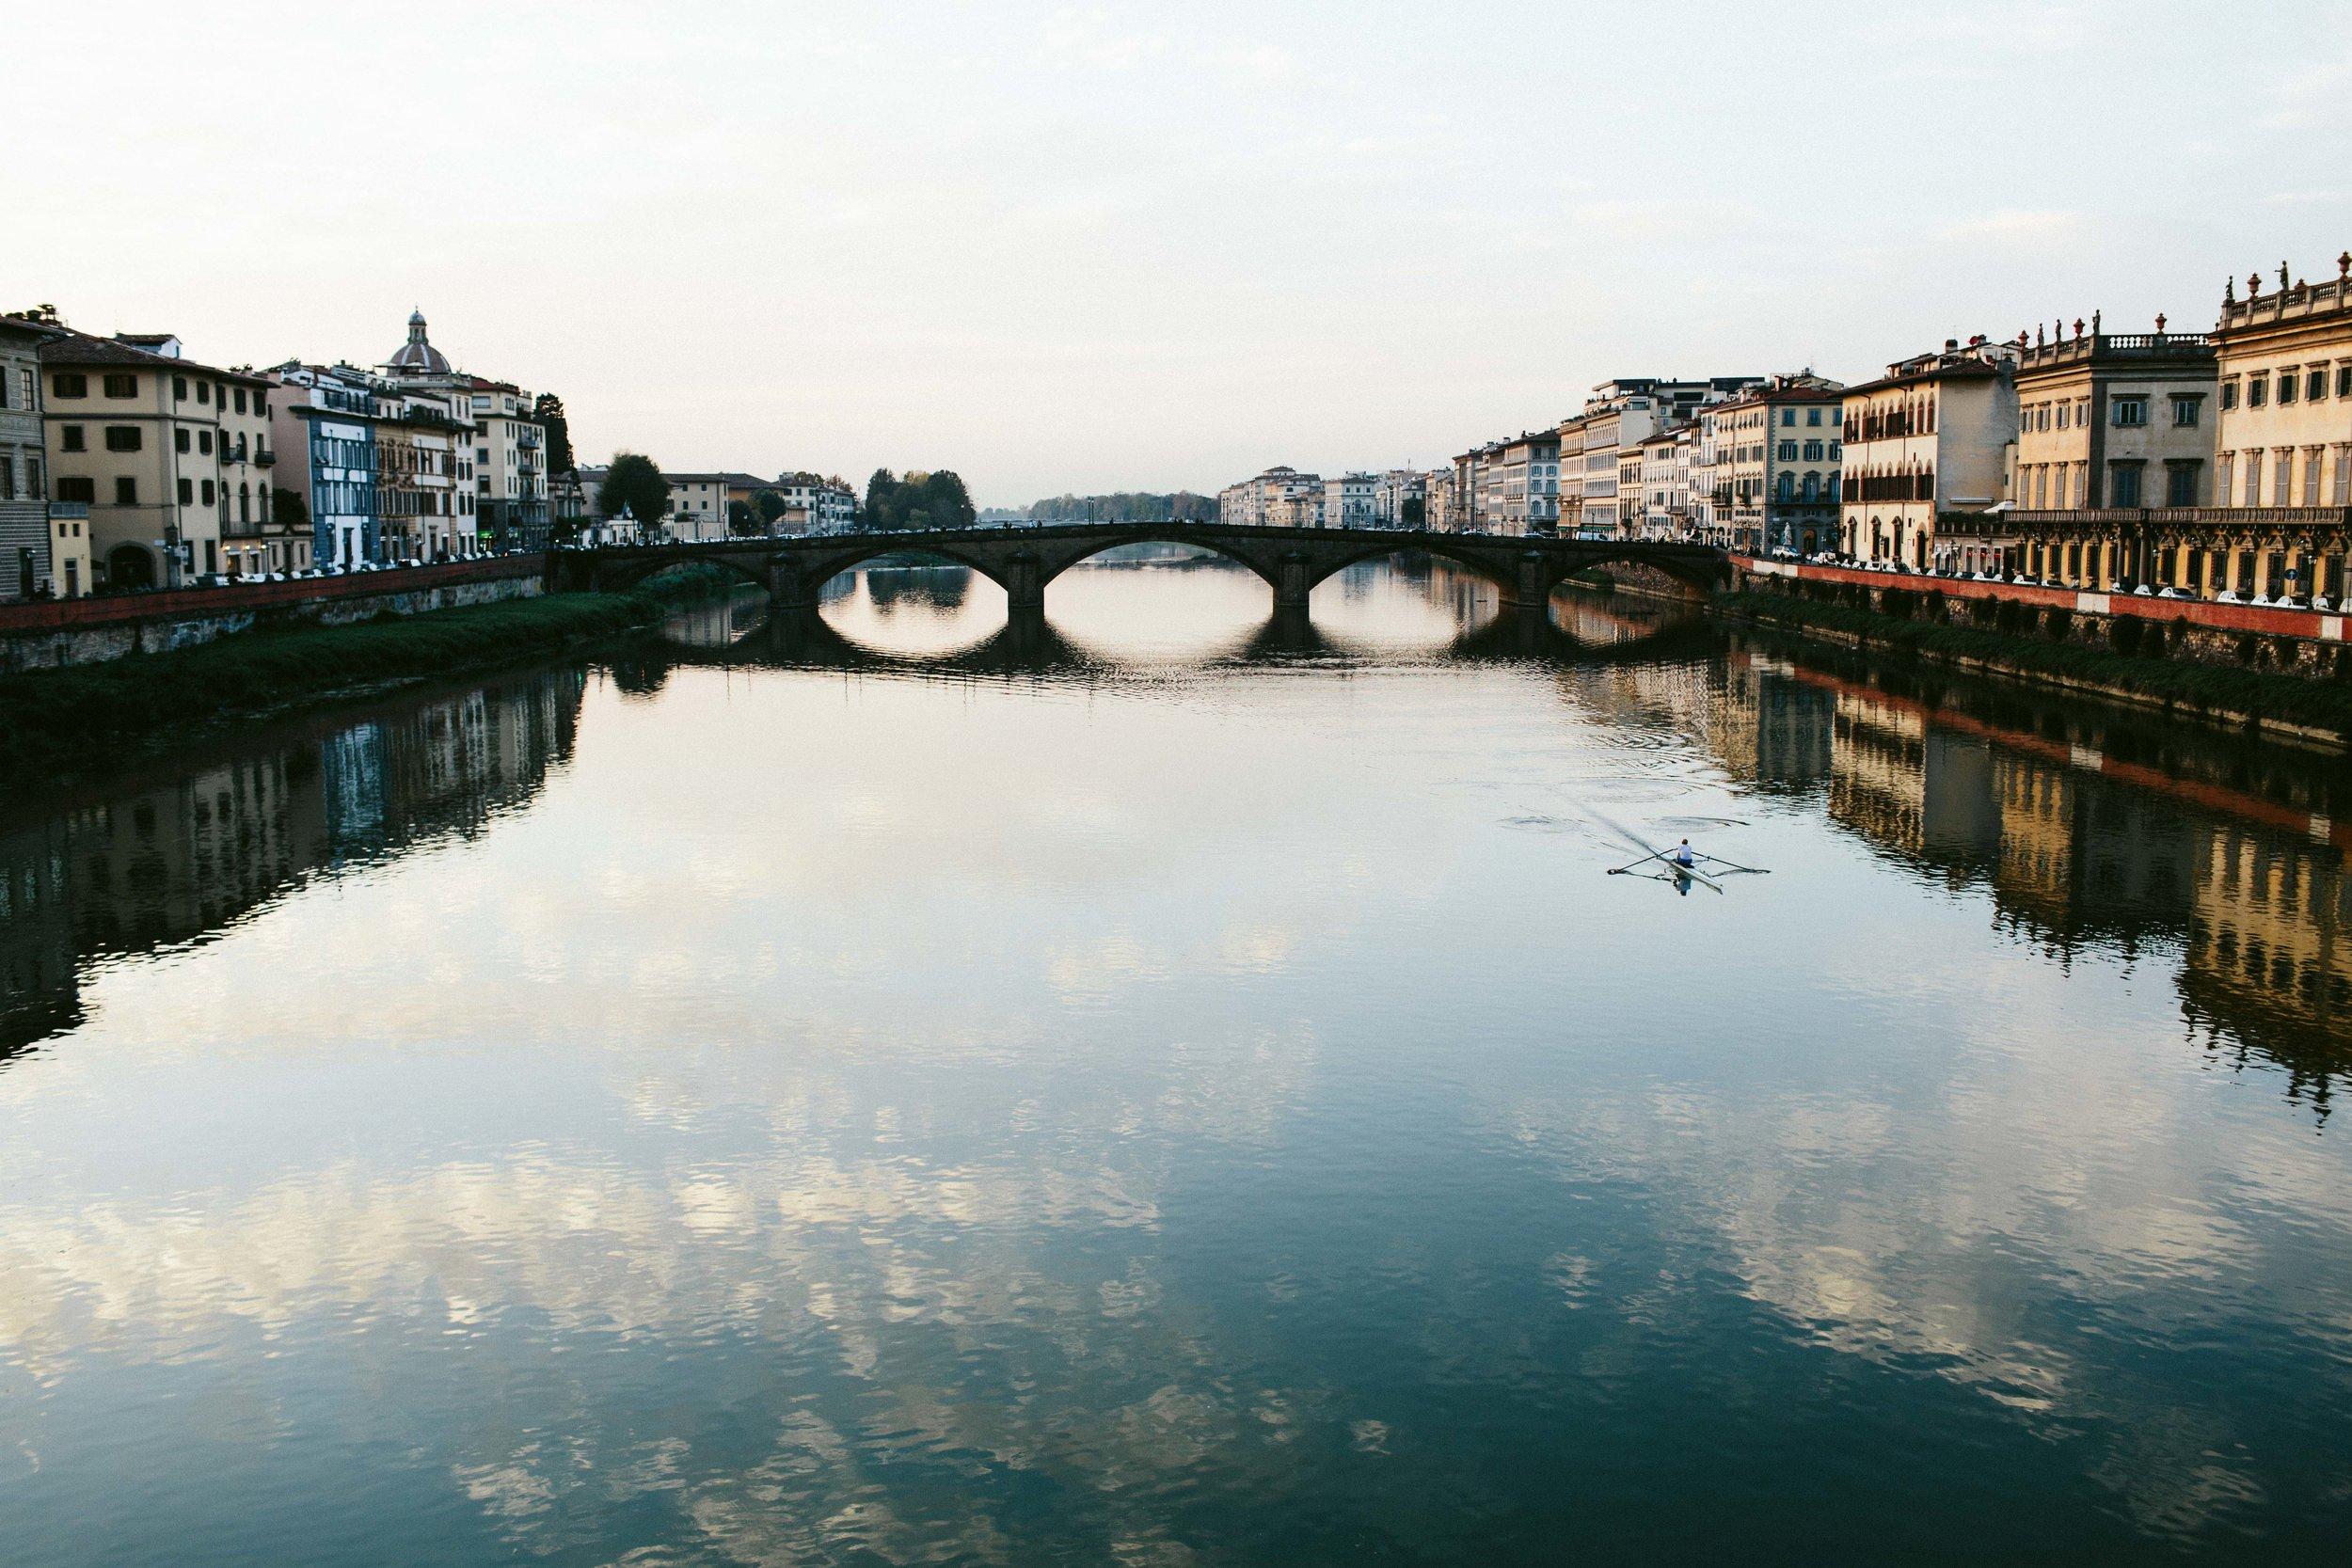 ITALY2015-503-61.jpg